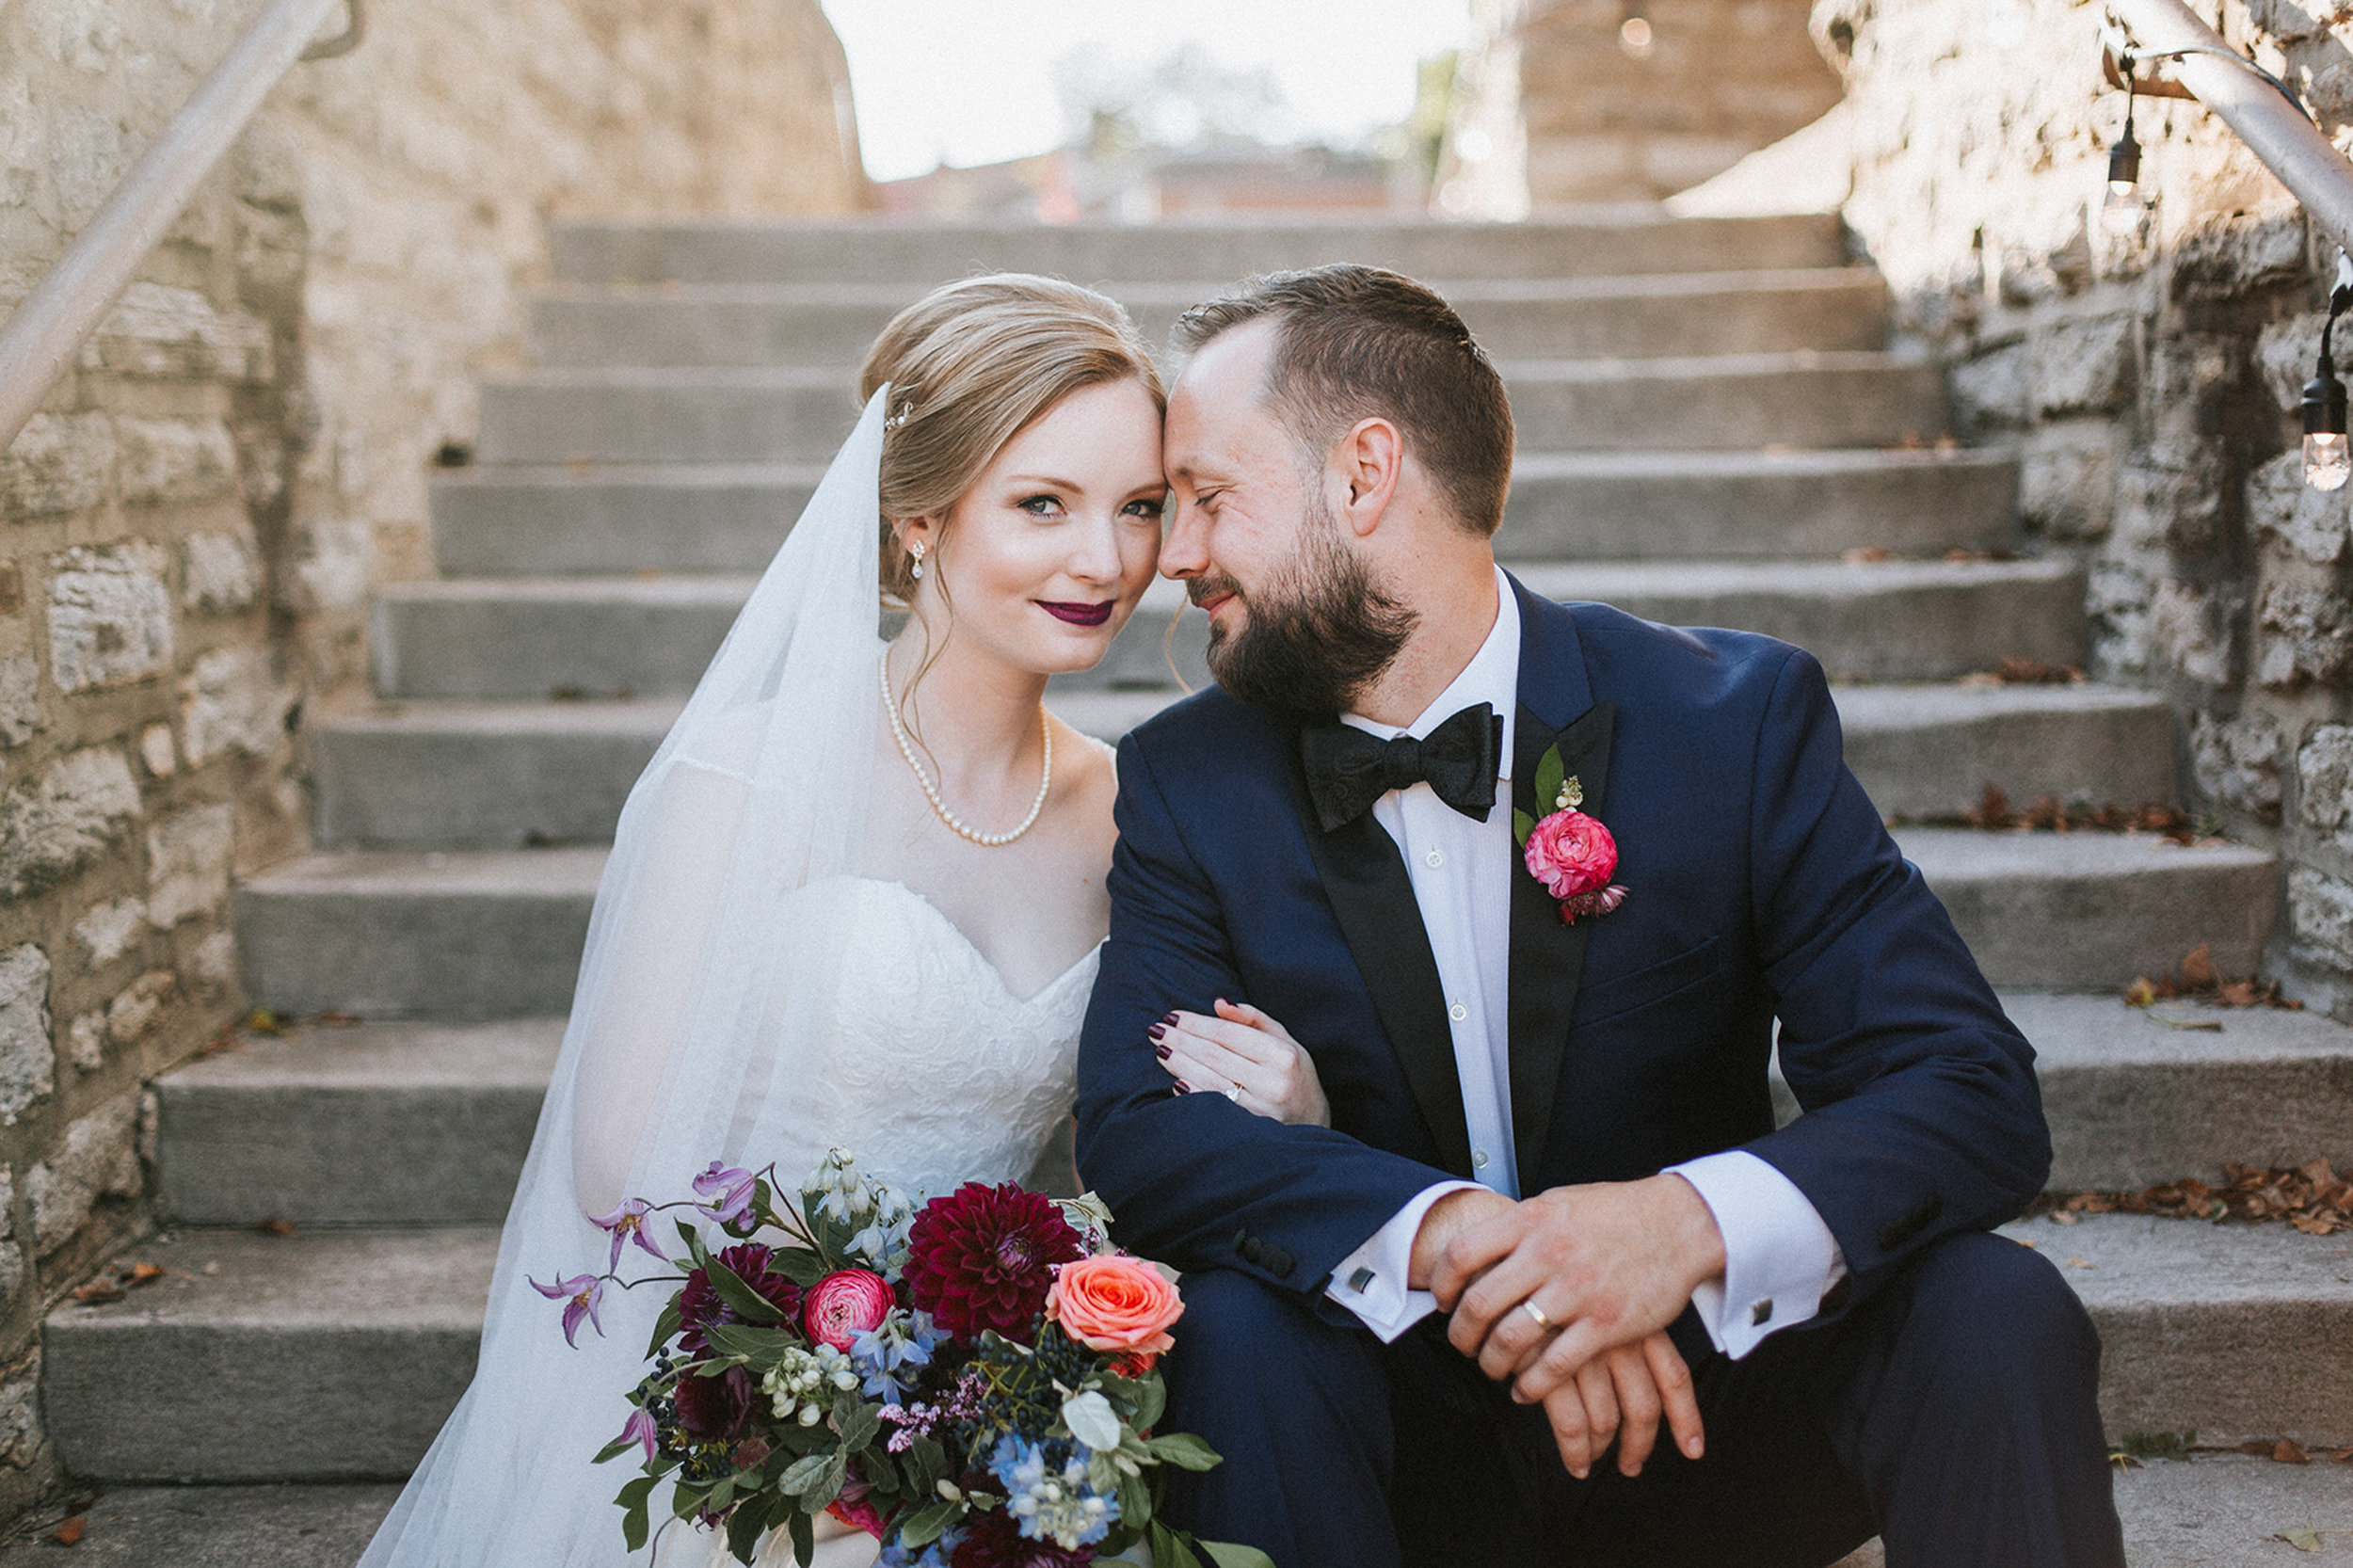 Brooke Townsend Photography - Ohio Wedding Photographer-178.jpg